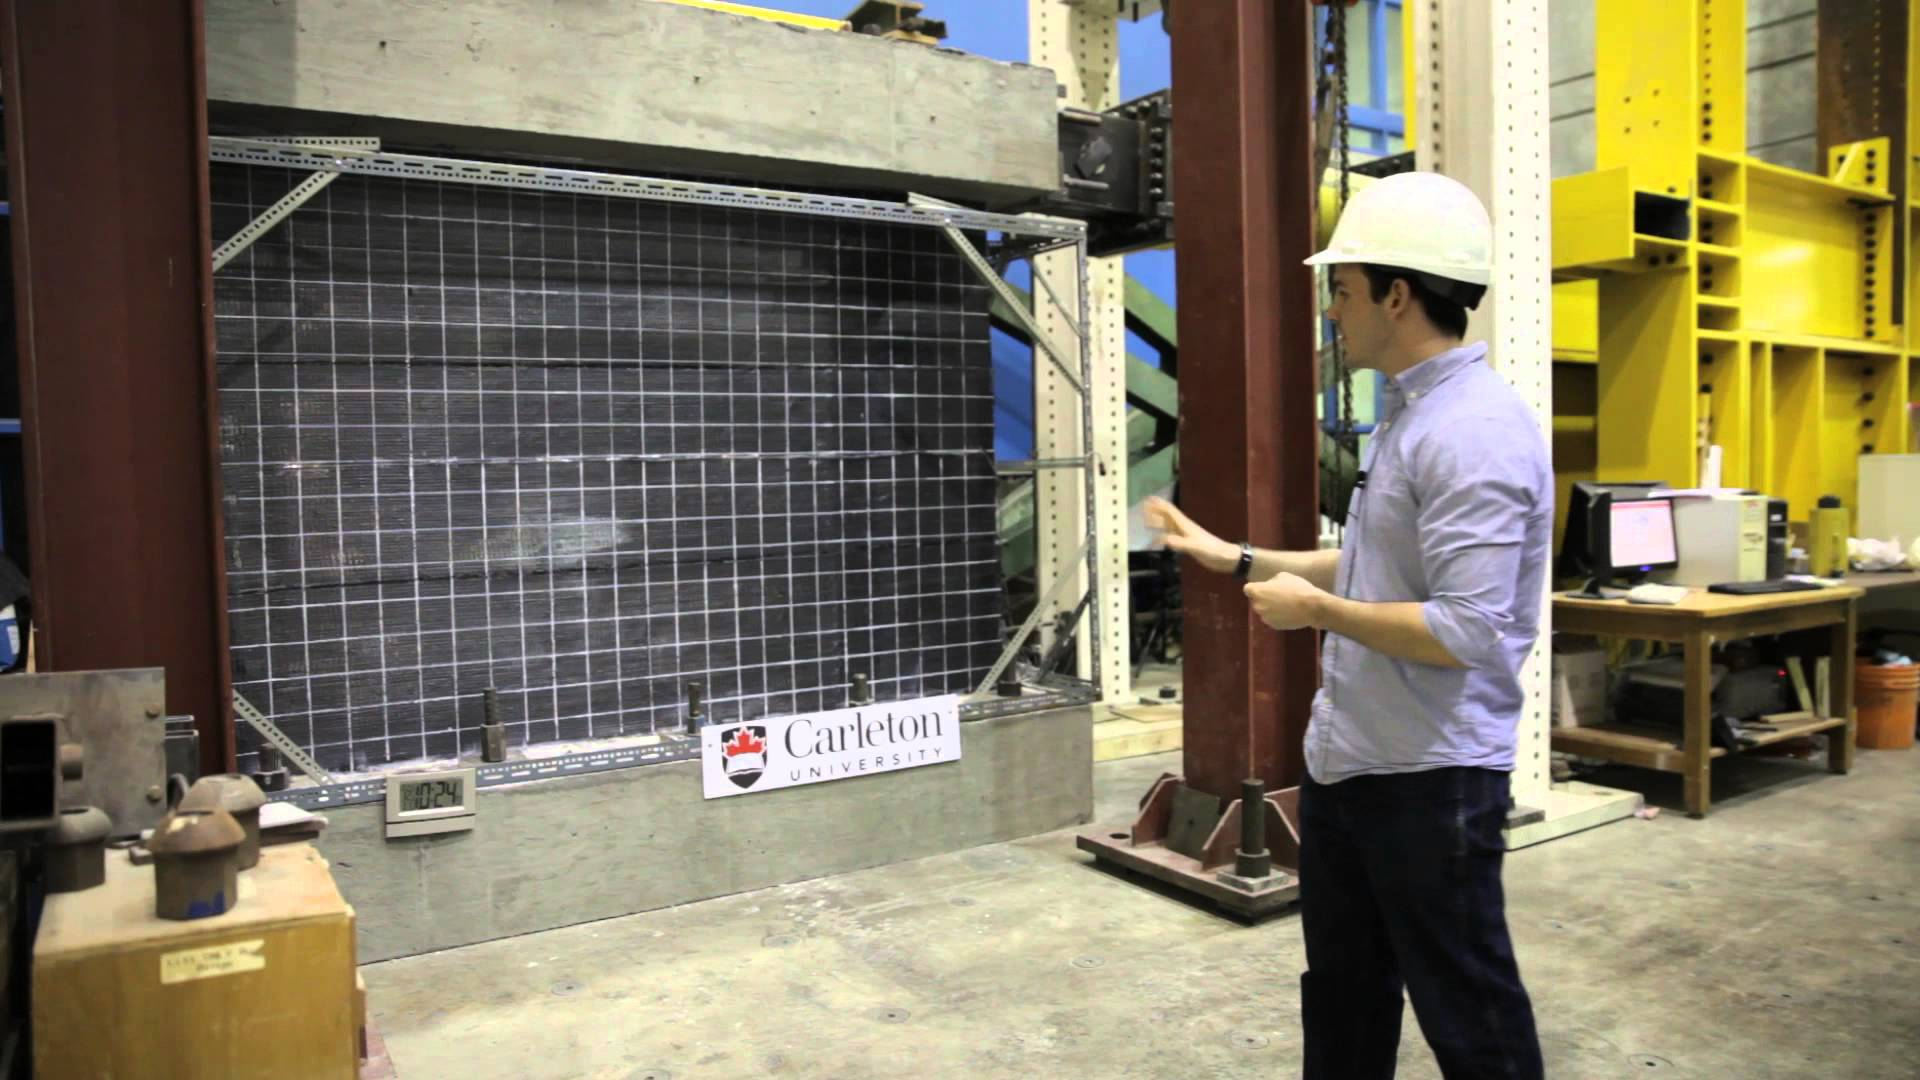 Thumbnail for: Carleton's Grad Programs in Civil Engineering